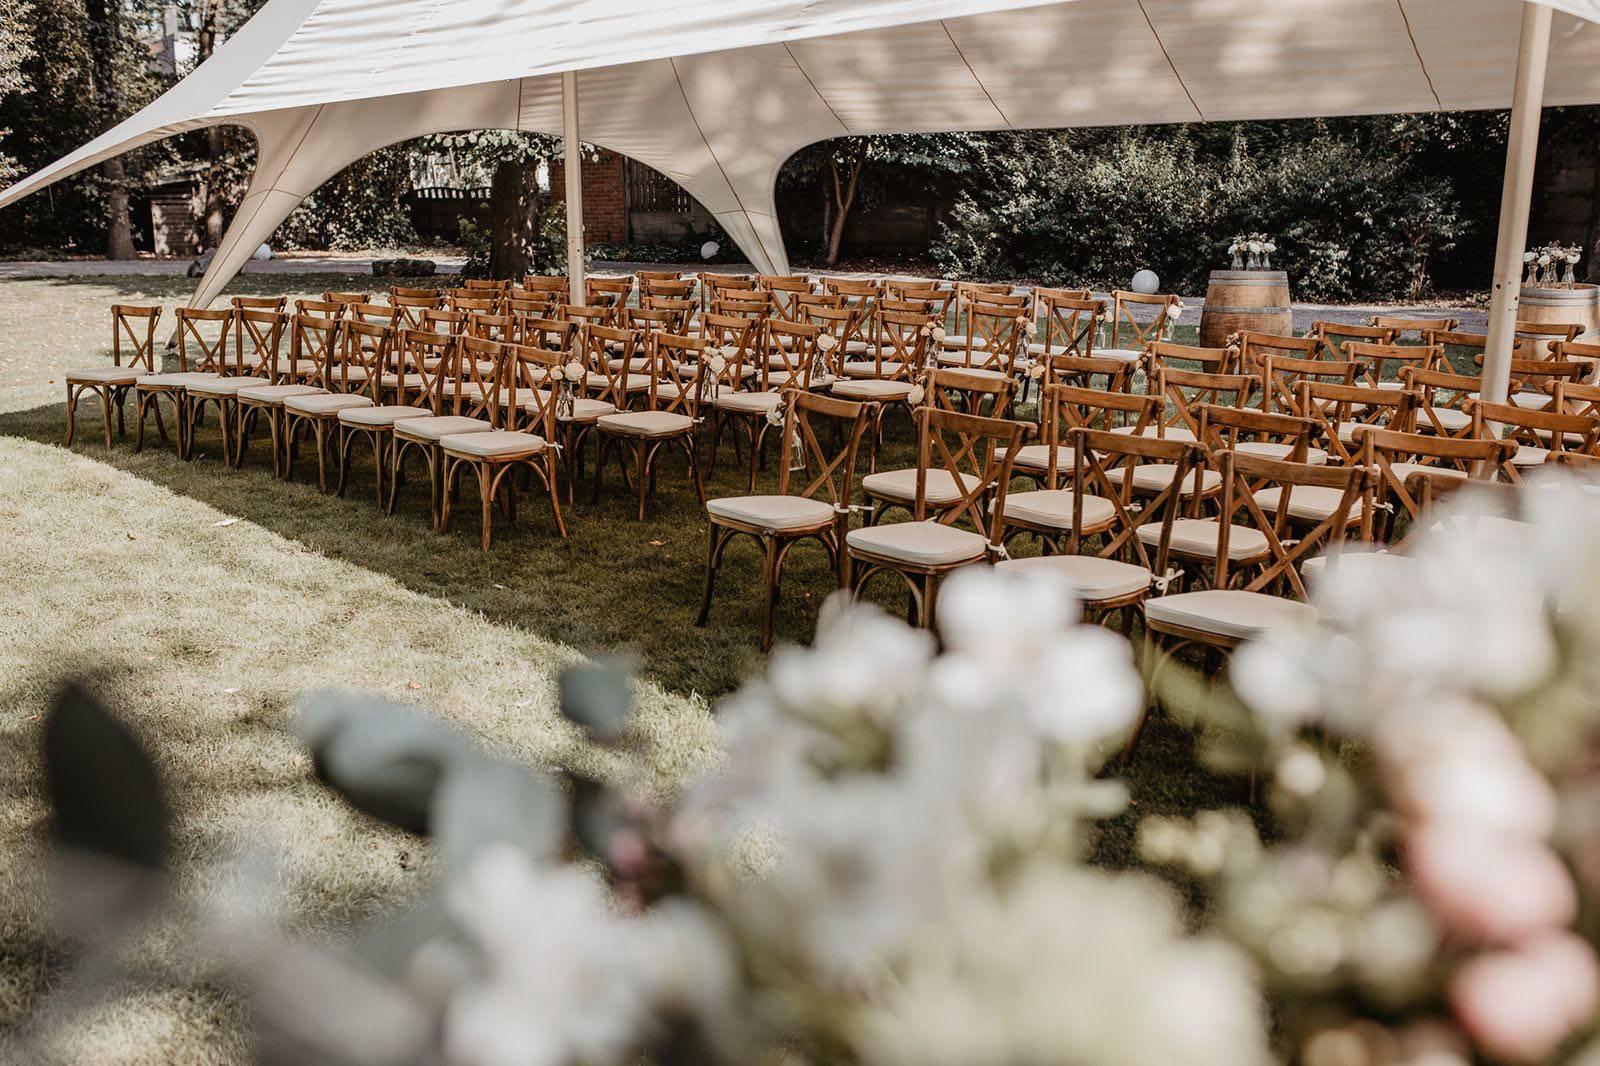 Event'L Ceremonie - Fotograaf Anneleen jegers 4 - House of Weddings